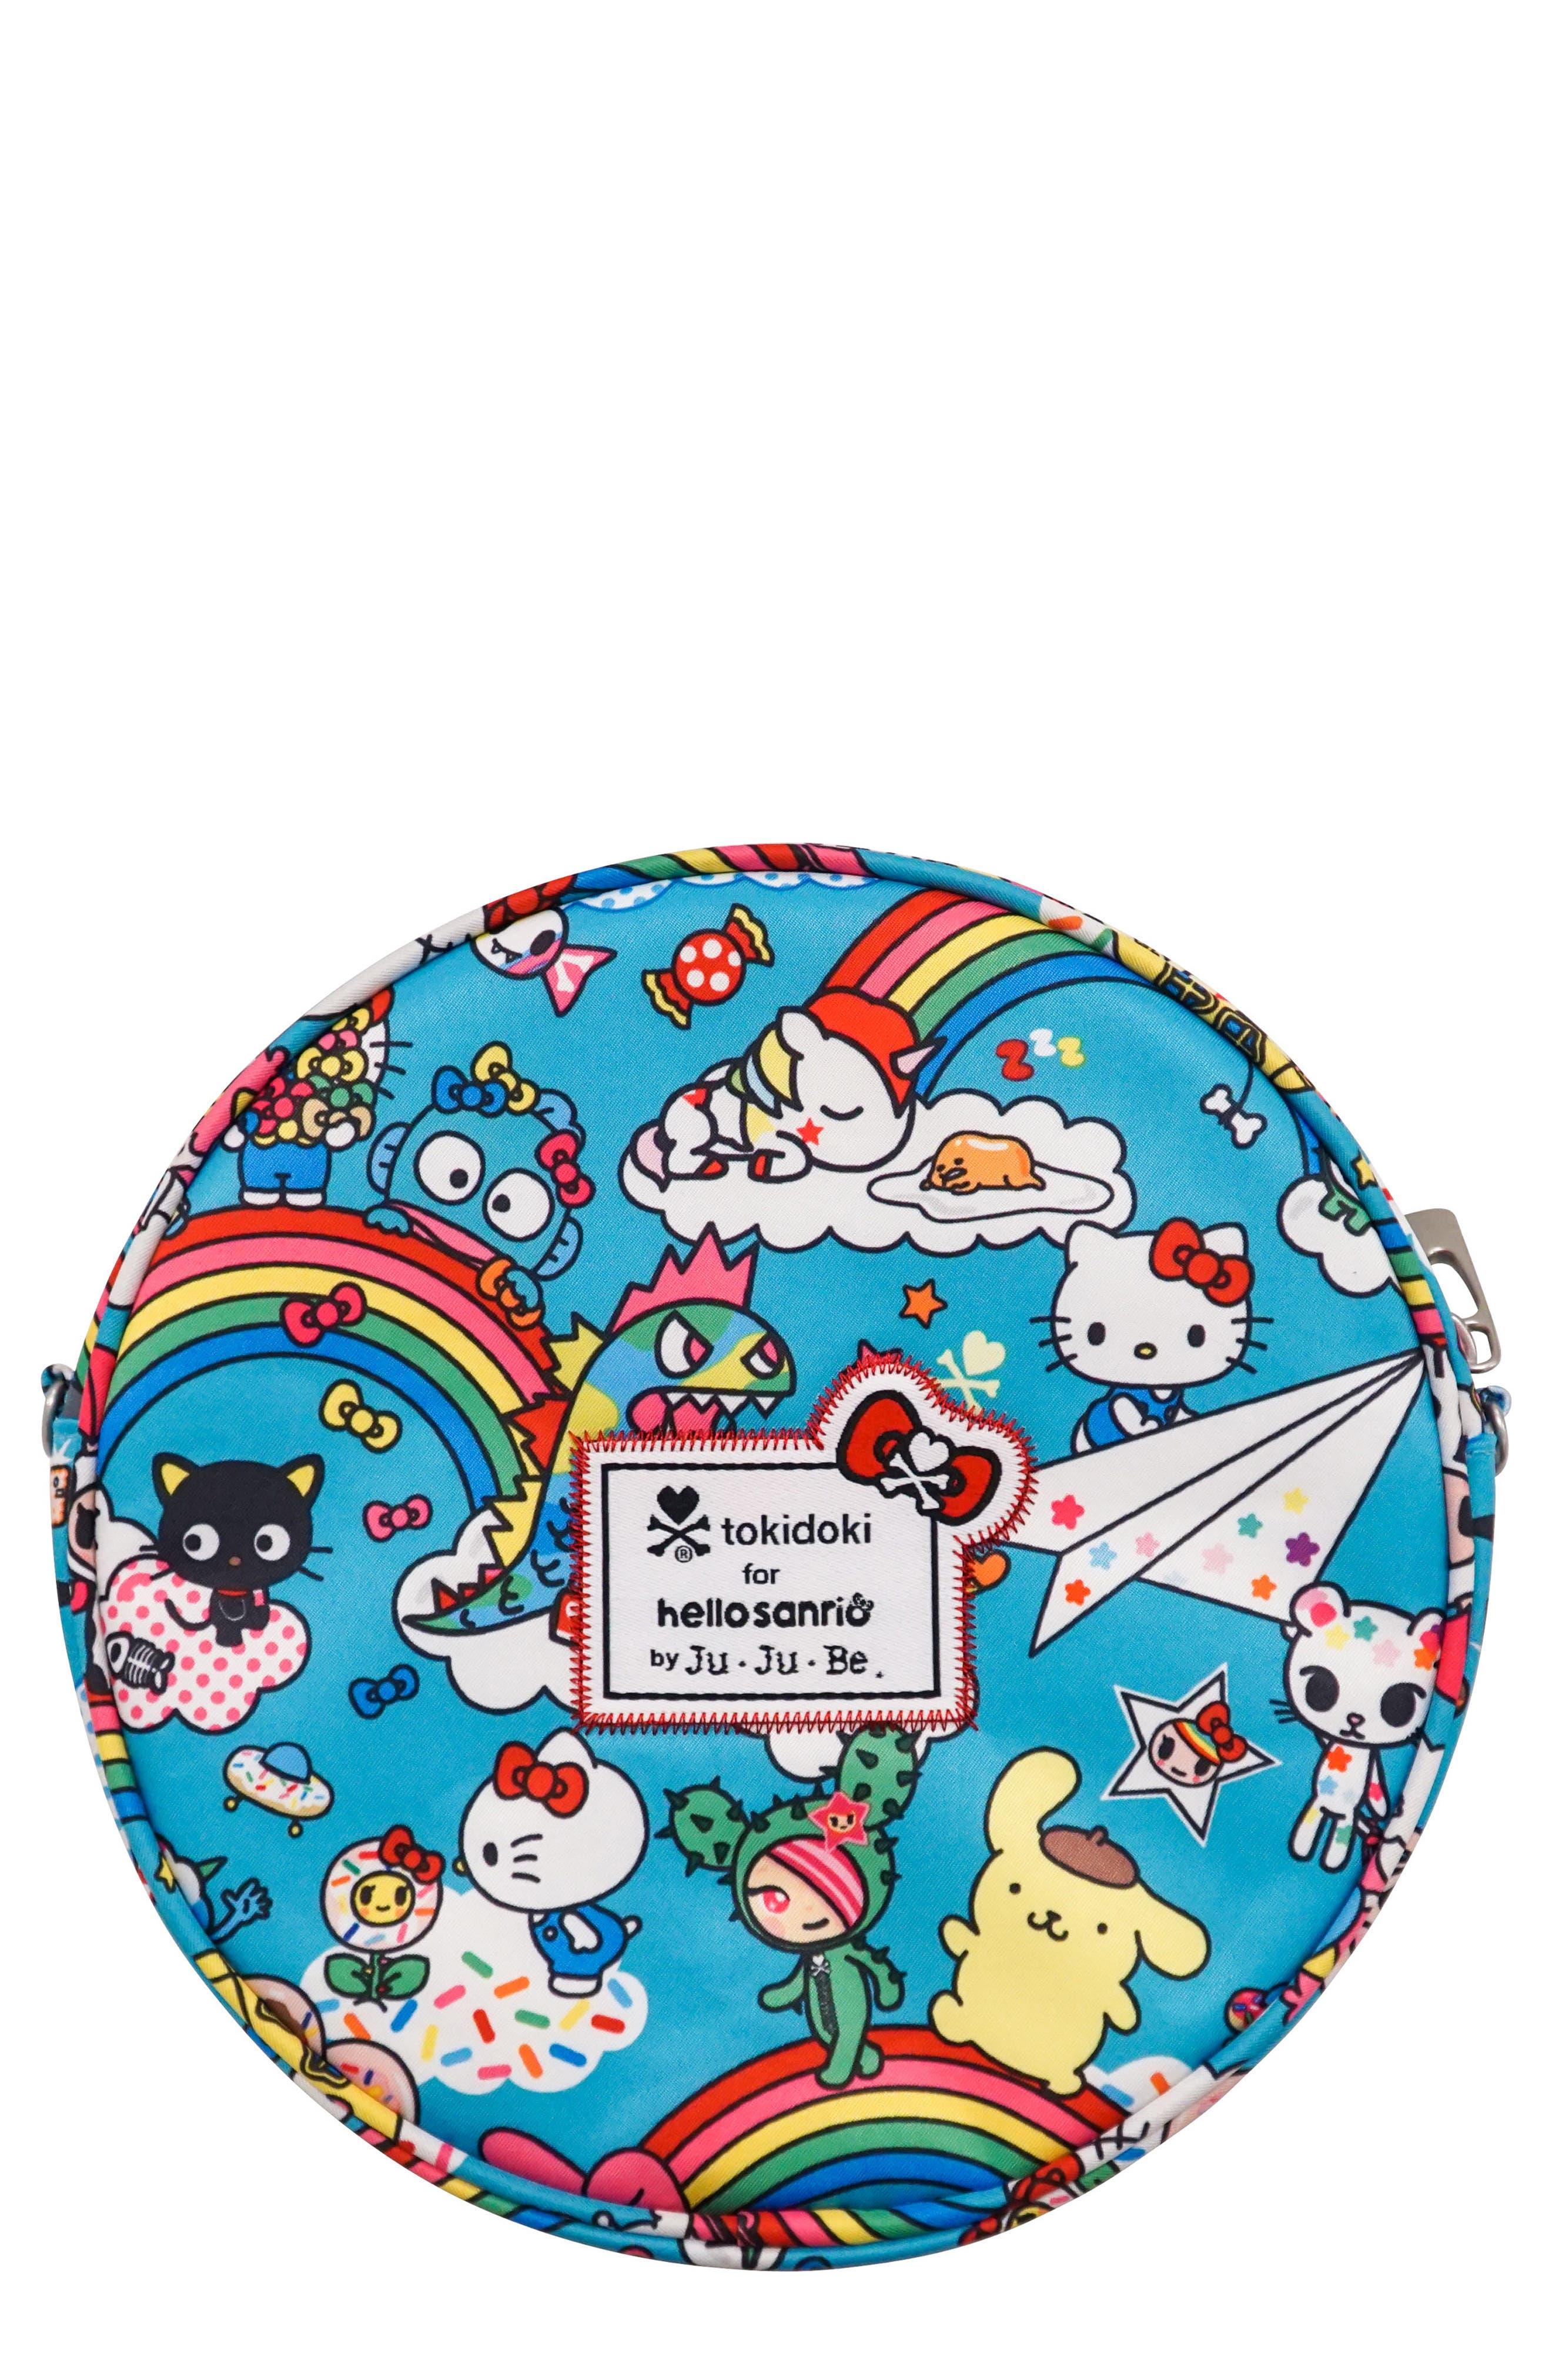 x tokidoki for Hello Sanrio Rainbow Dreams Be Bop Mini Bag,                             Main thumbnail 1, color,                             Rainbow Dreams